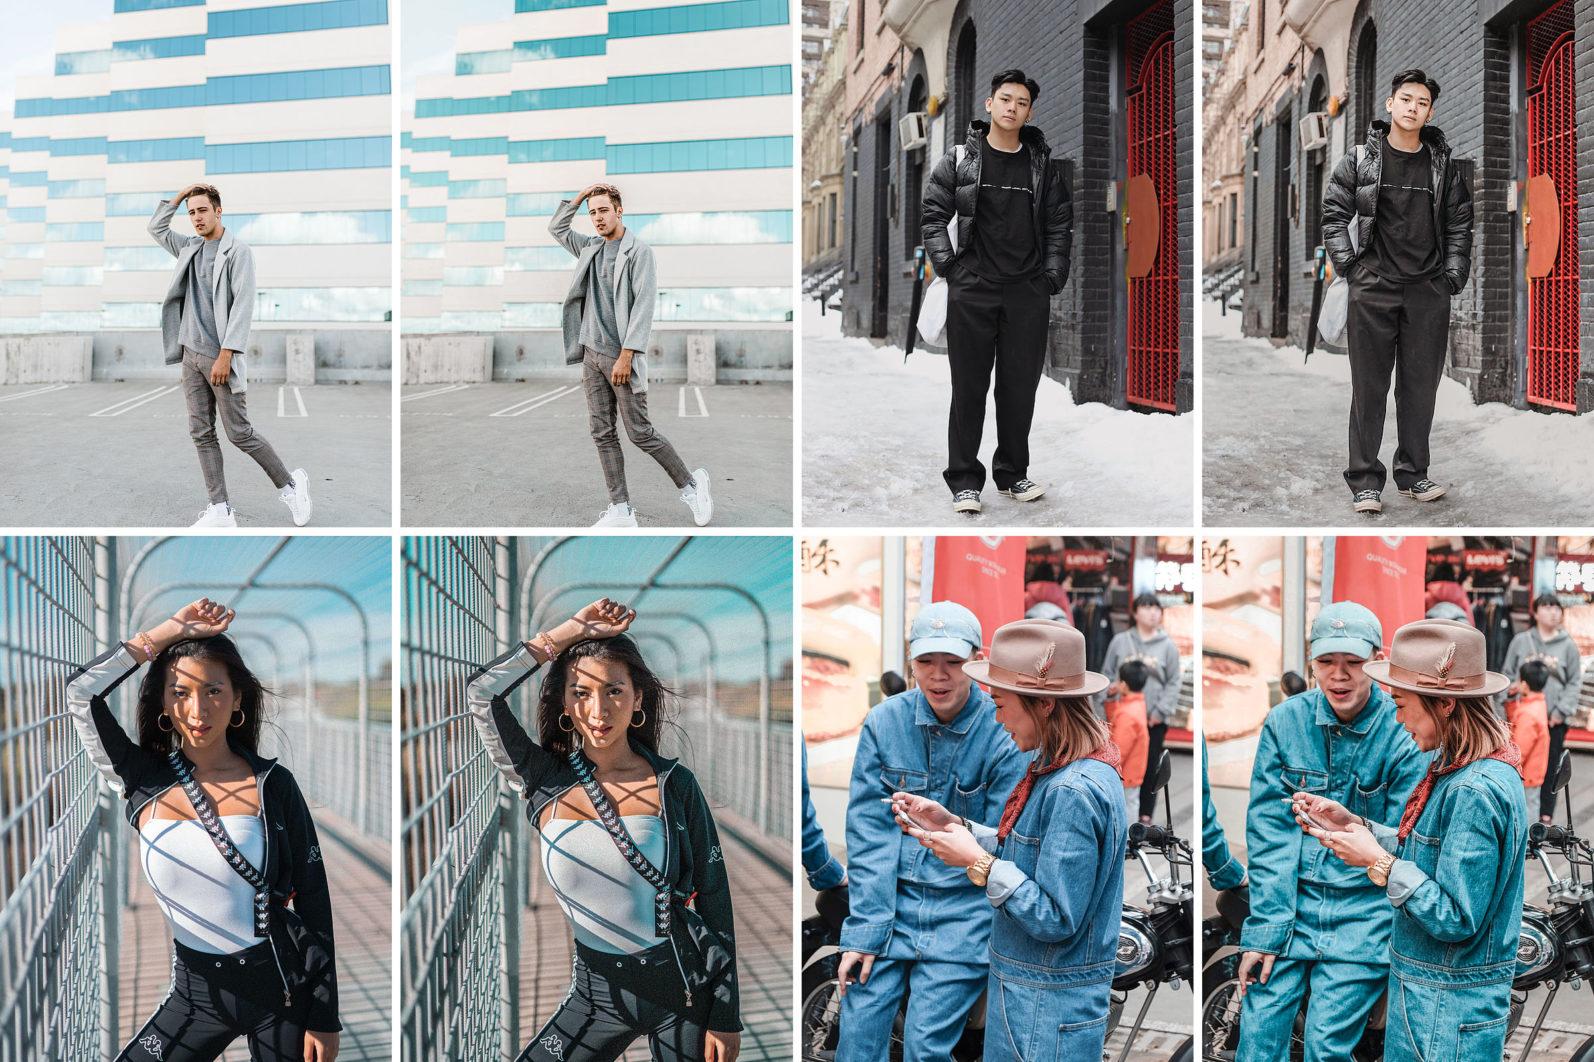 39. Street Fashion - 39.STREETFASHION 3 -